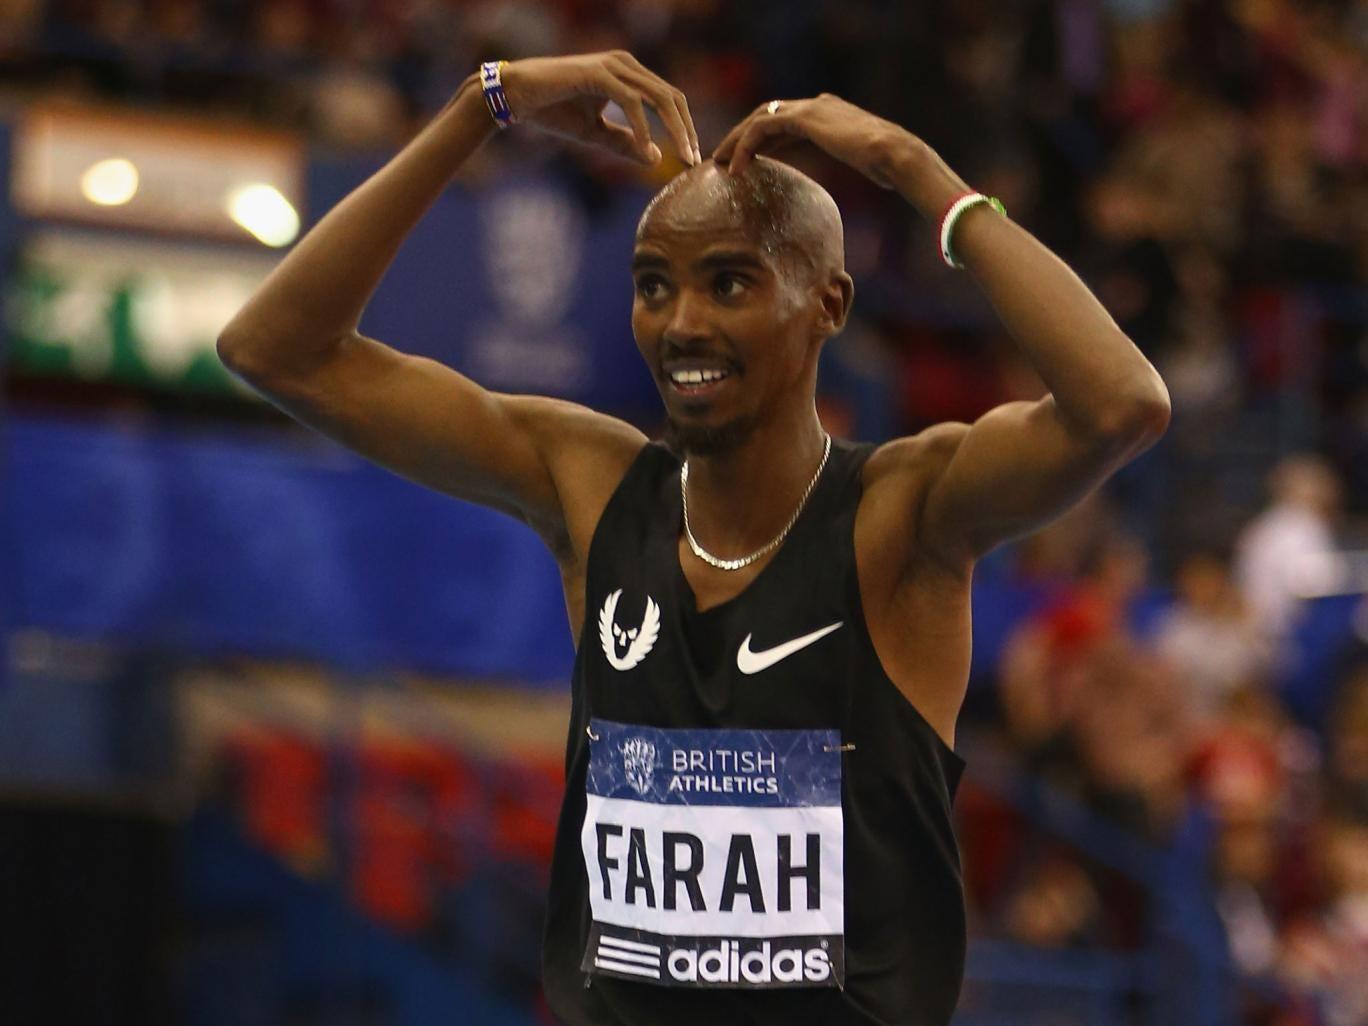 Mo Farah celebrates his 3,000m win